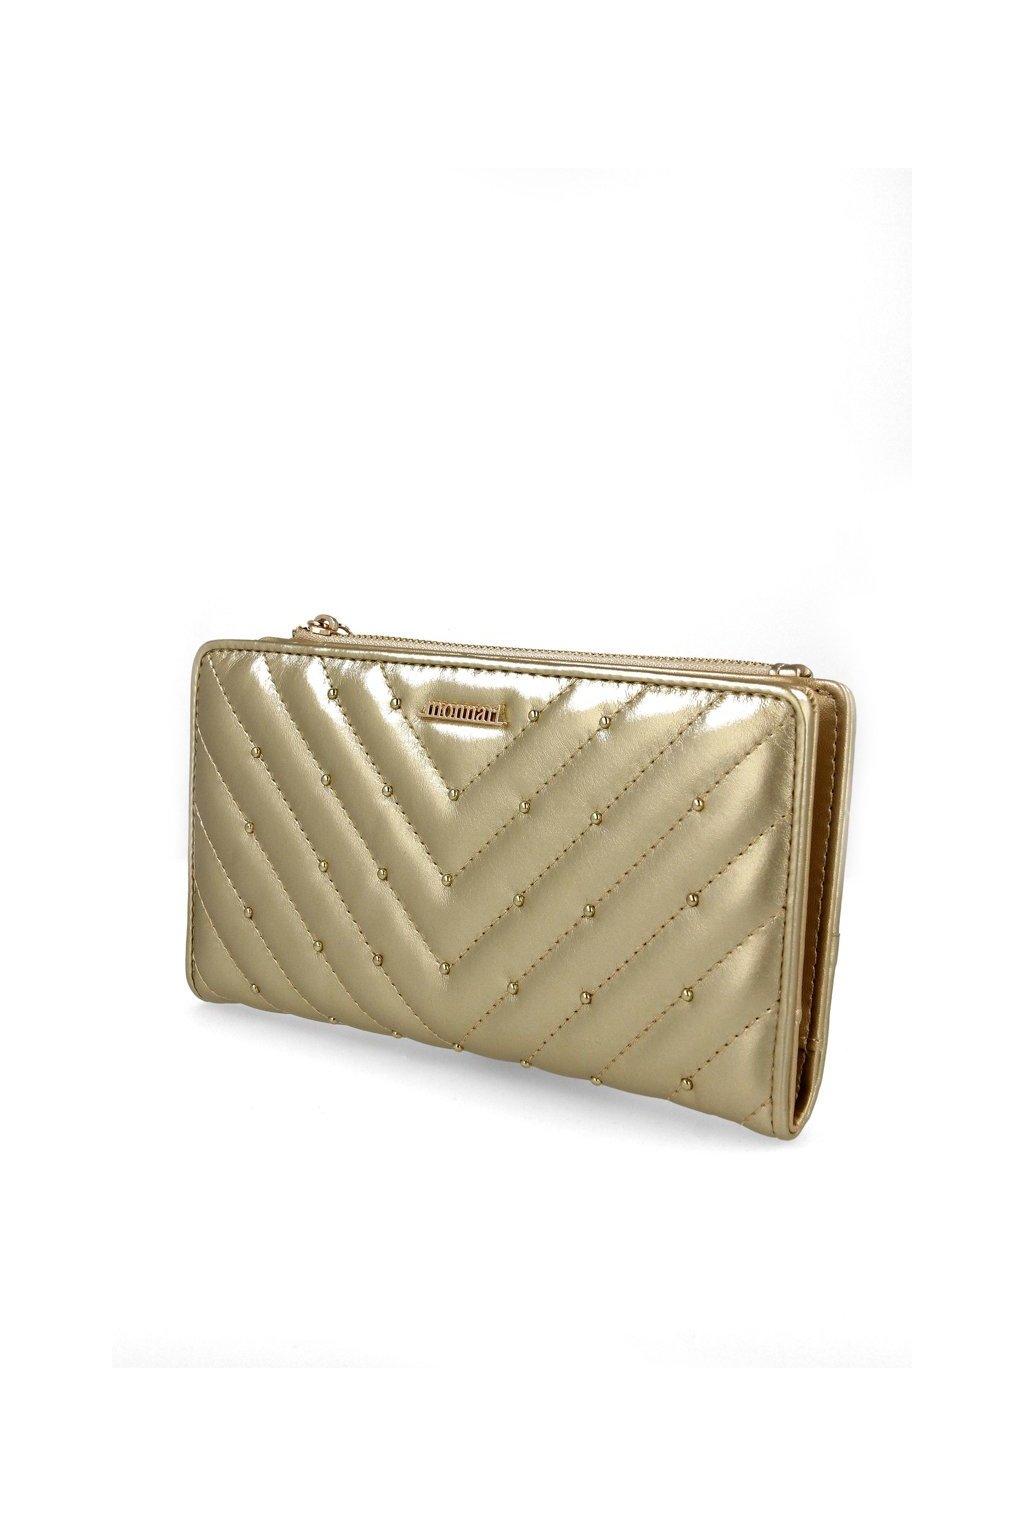 Peňaženka farba žltá kód PUR0010-023